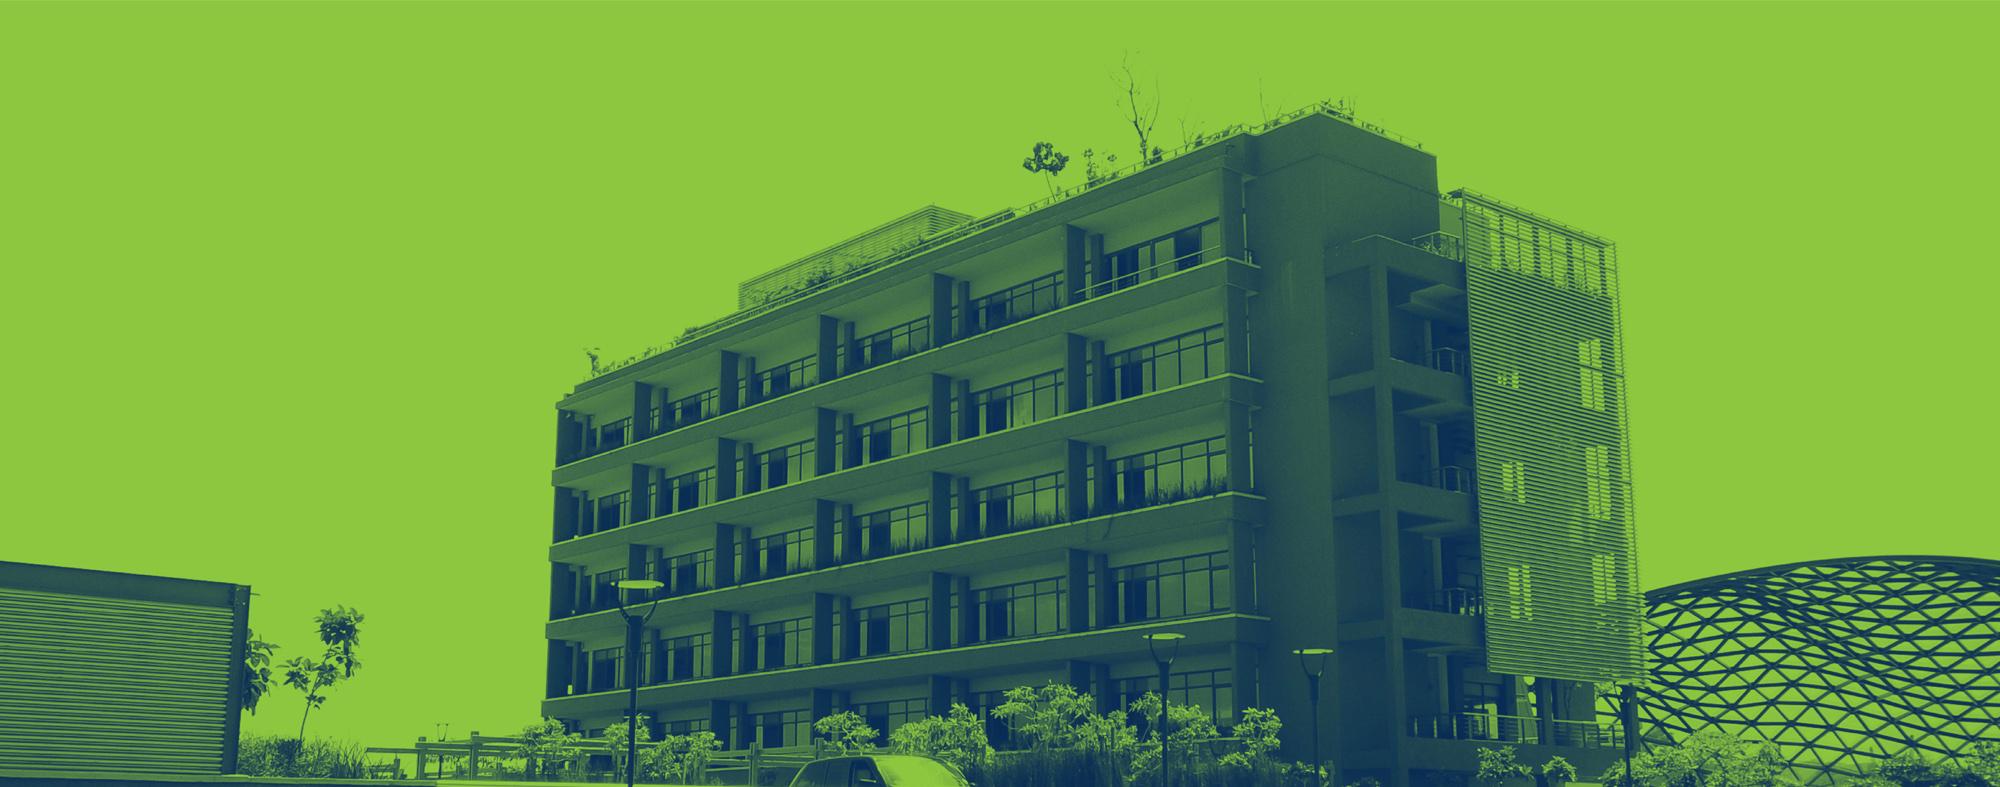 Delta BEC Cover Image building